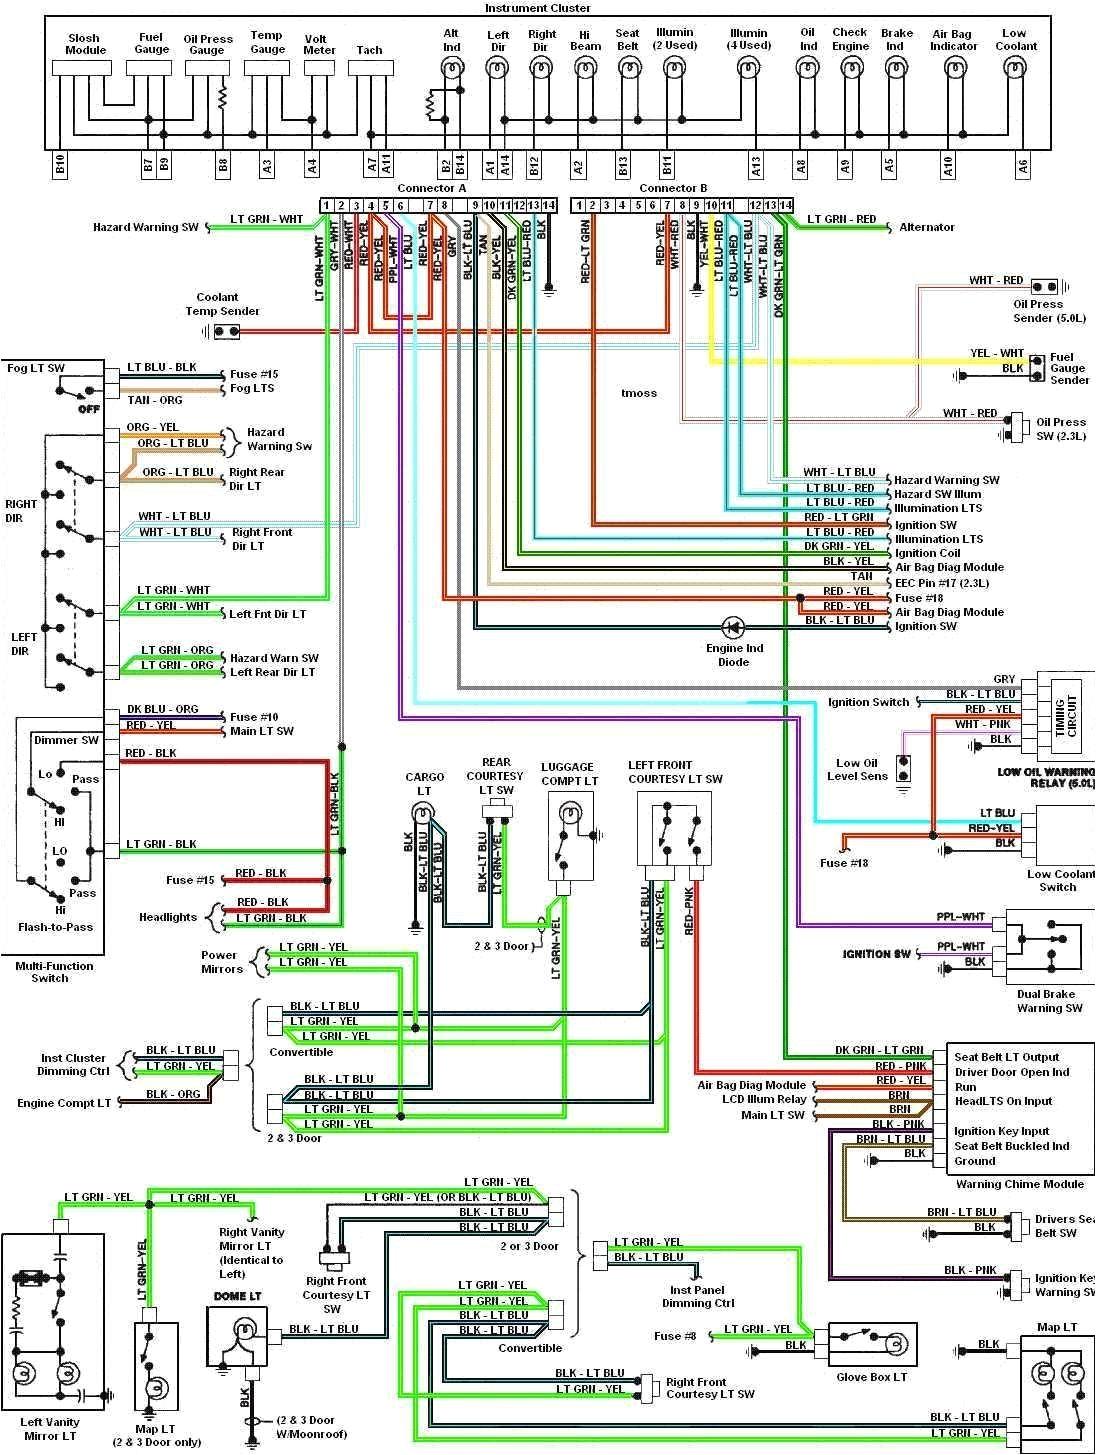 04 mustang wiring diagram wiring diagram centre wiring diagram ford mustang 2004